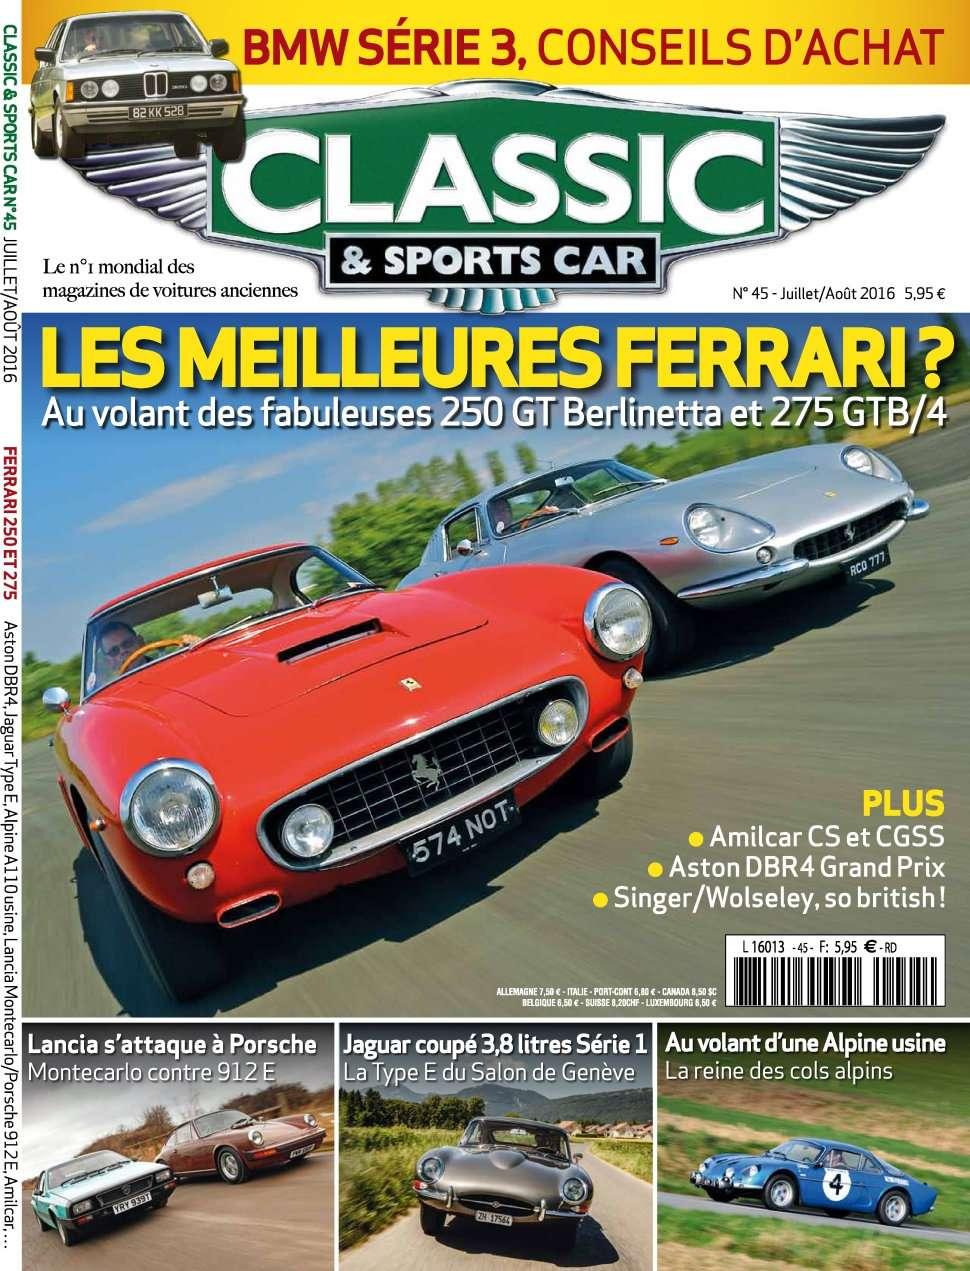 Classic & Sports Car 45 - Juillet/Aout 2016